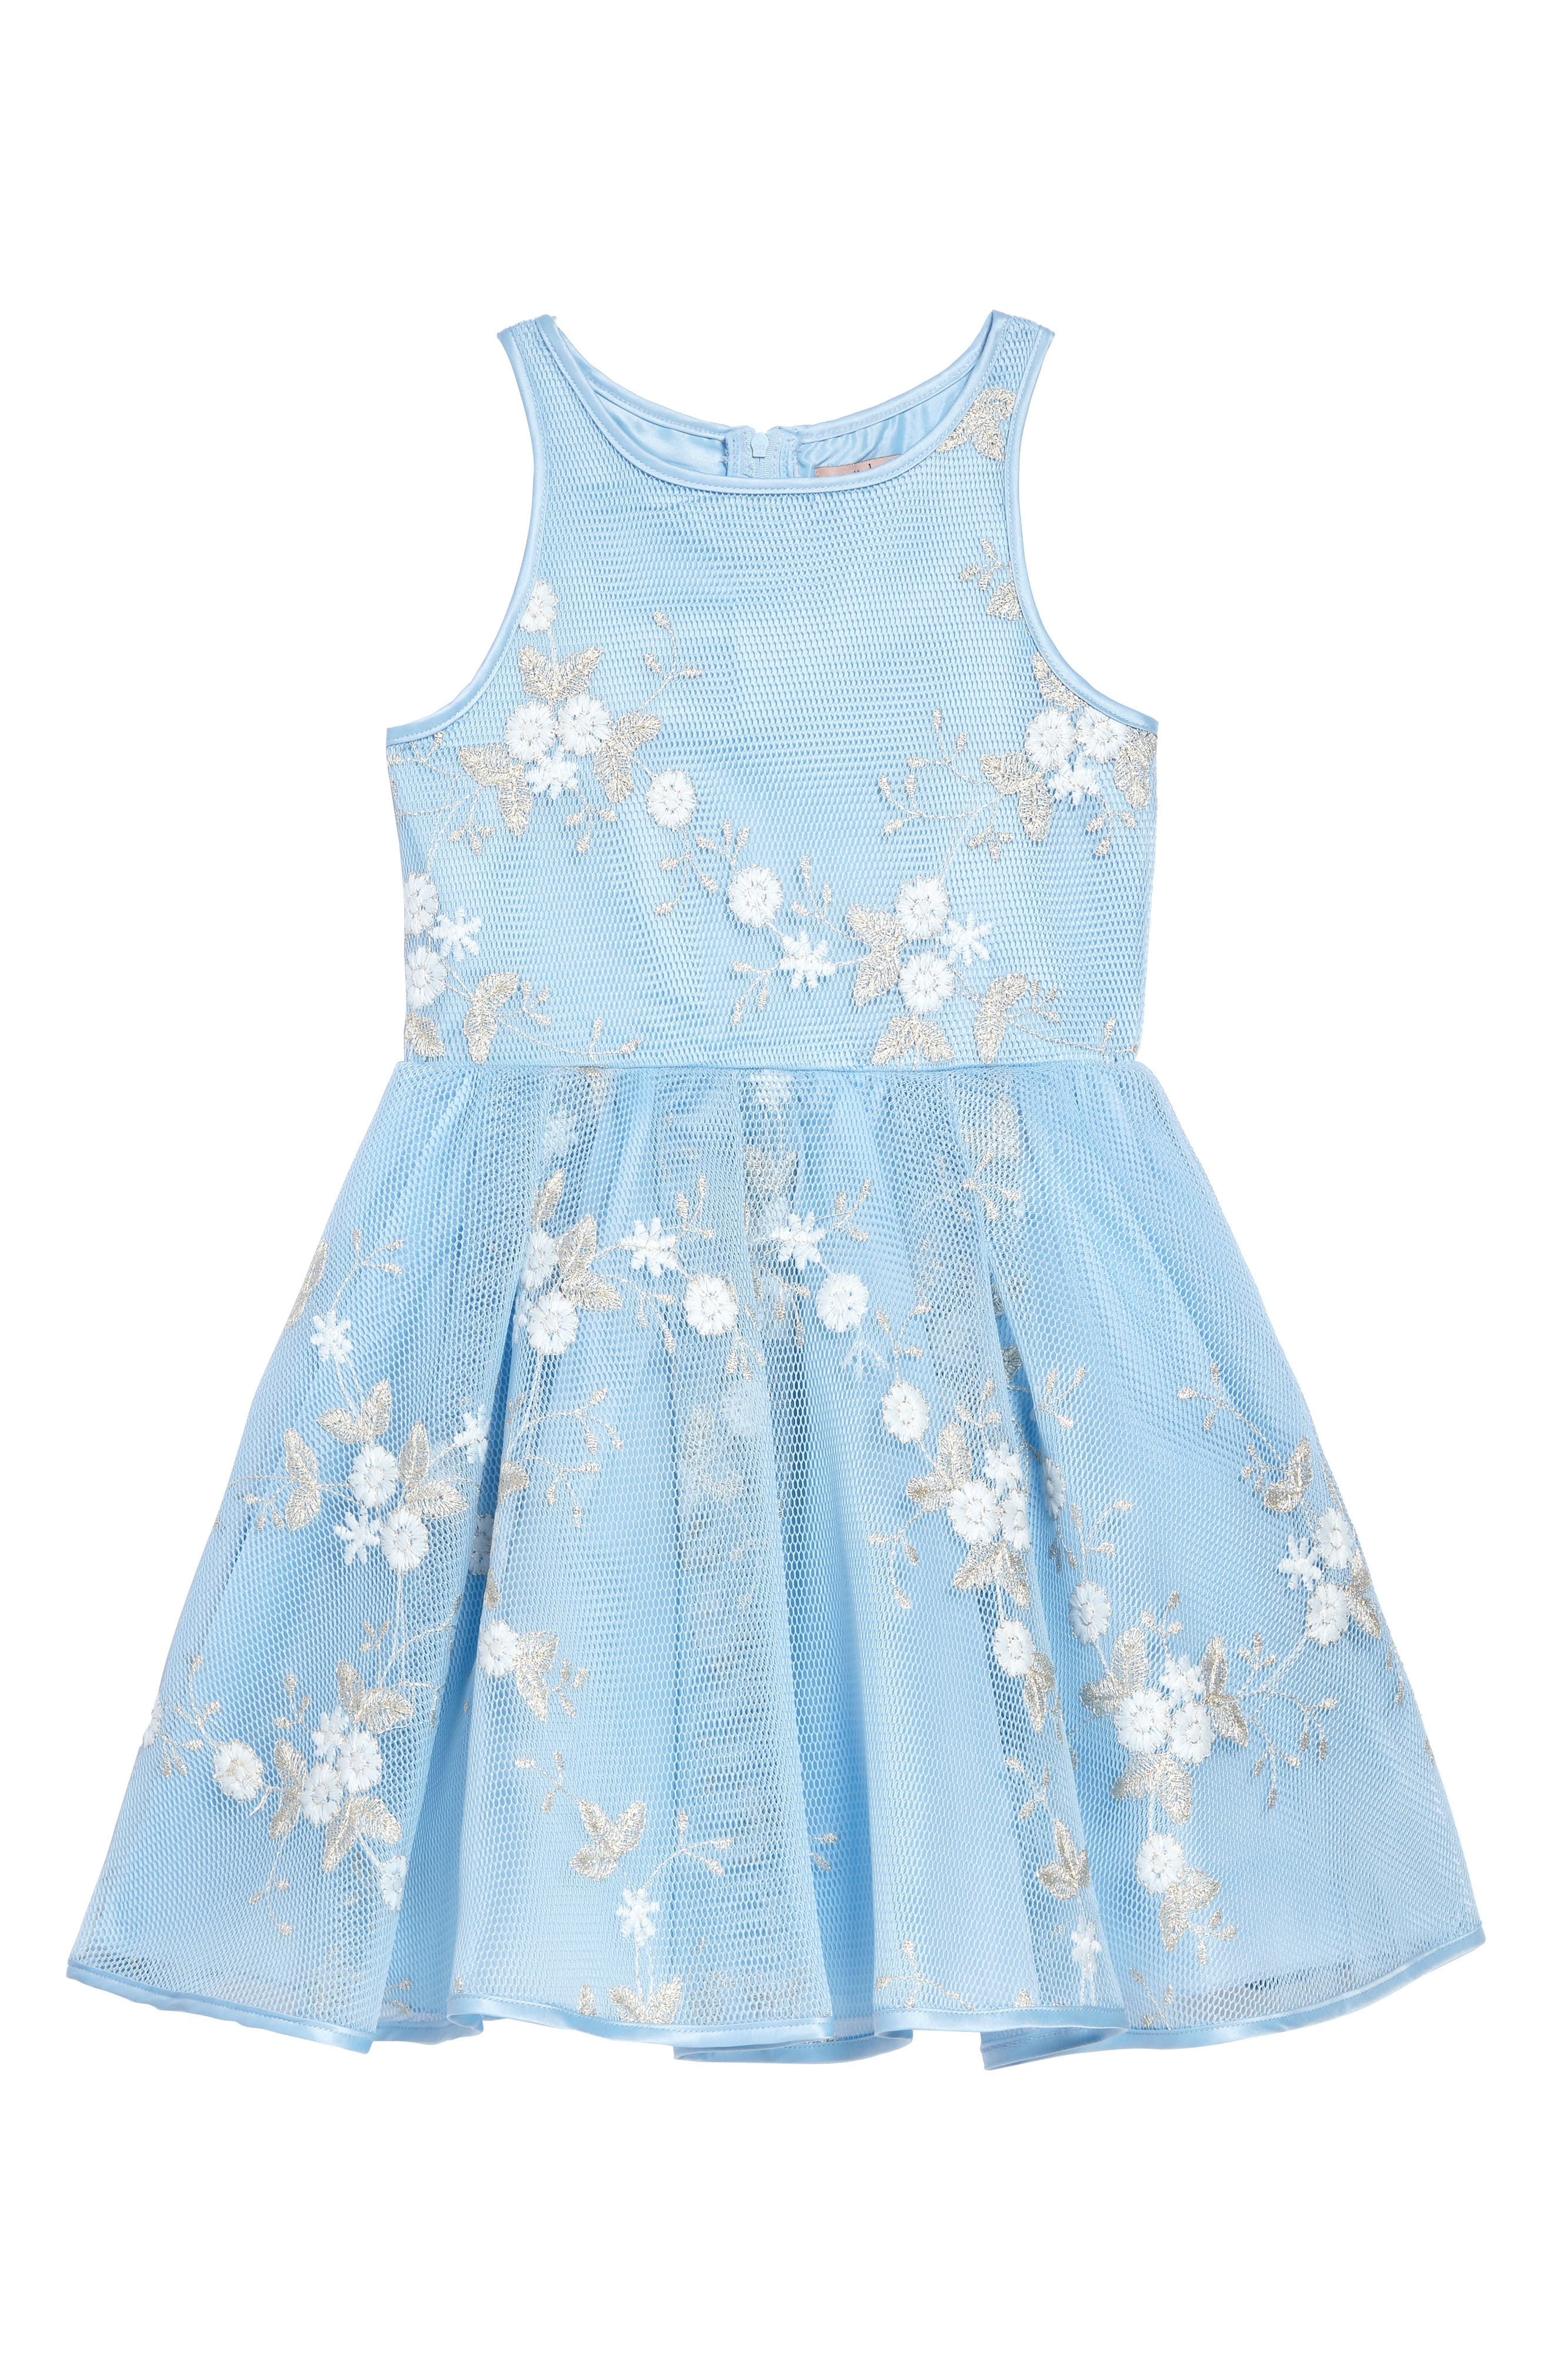 Embroidered Mesh Dress,                             Main thumbnail 1, color,                             452